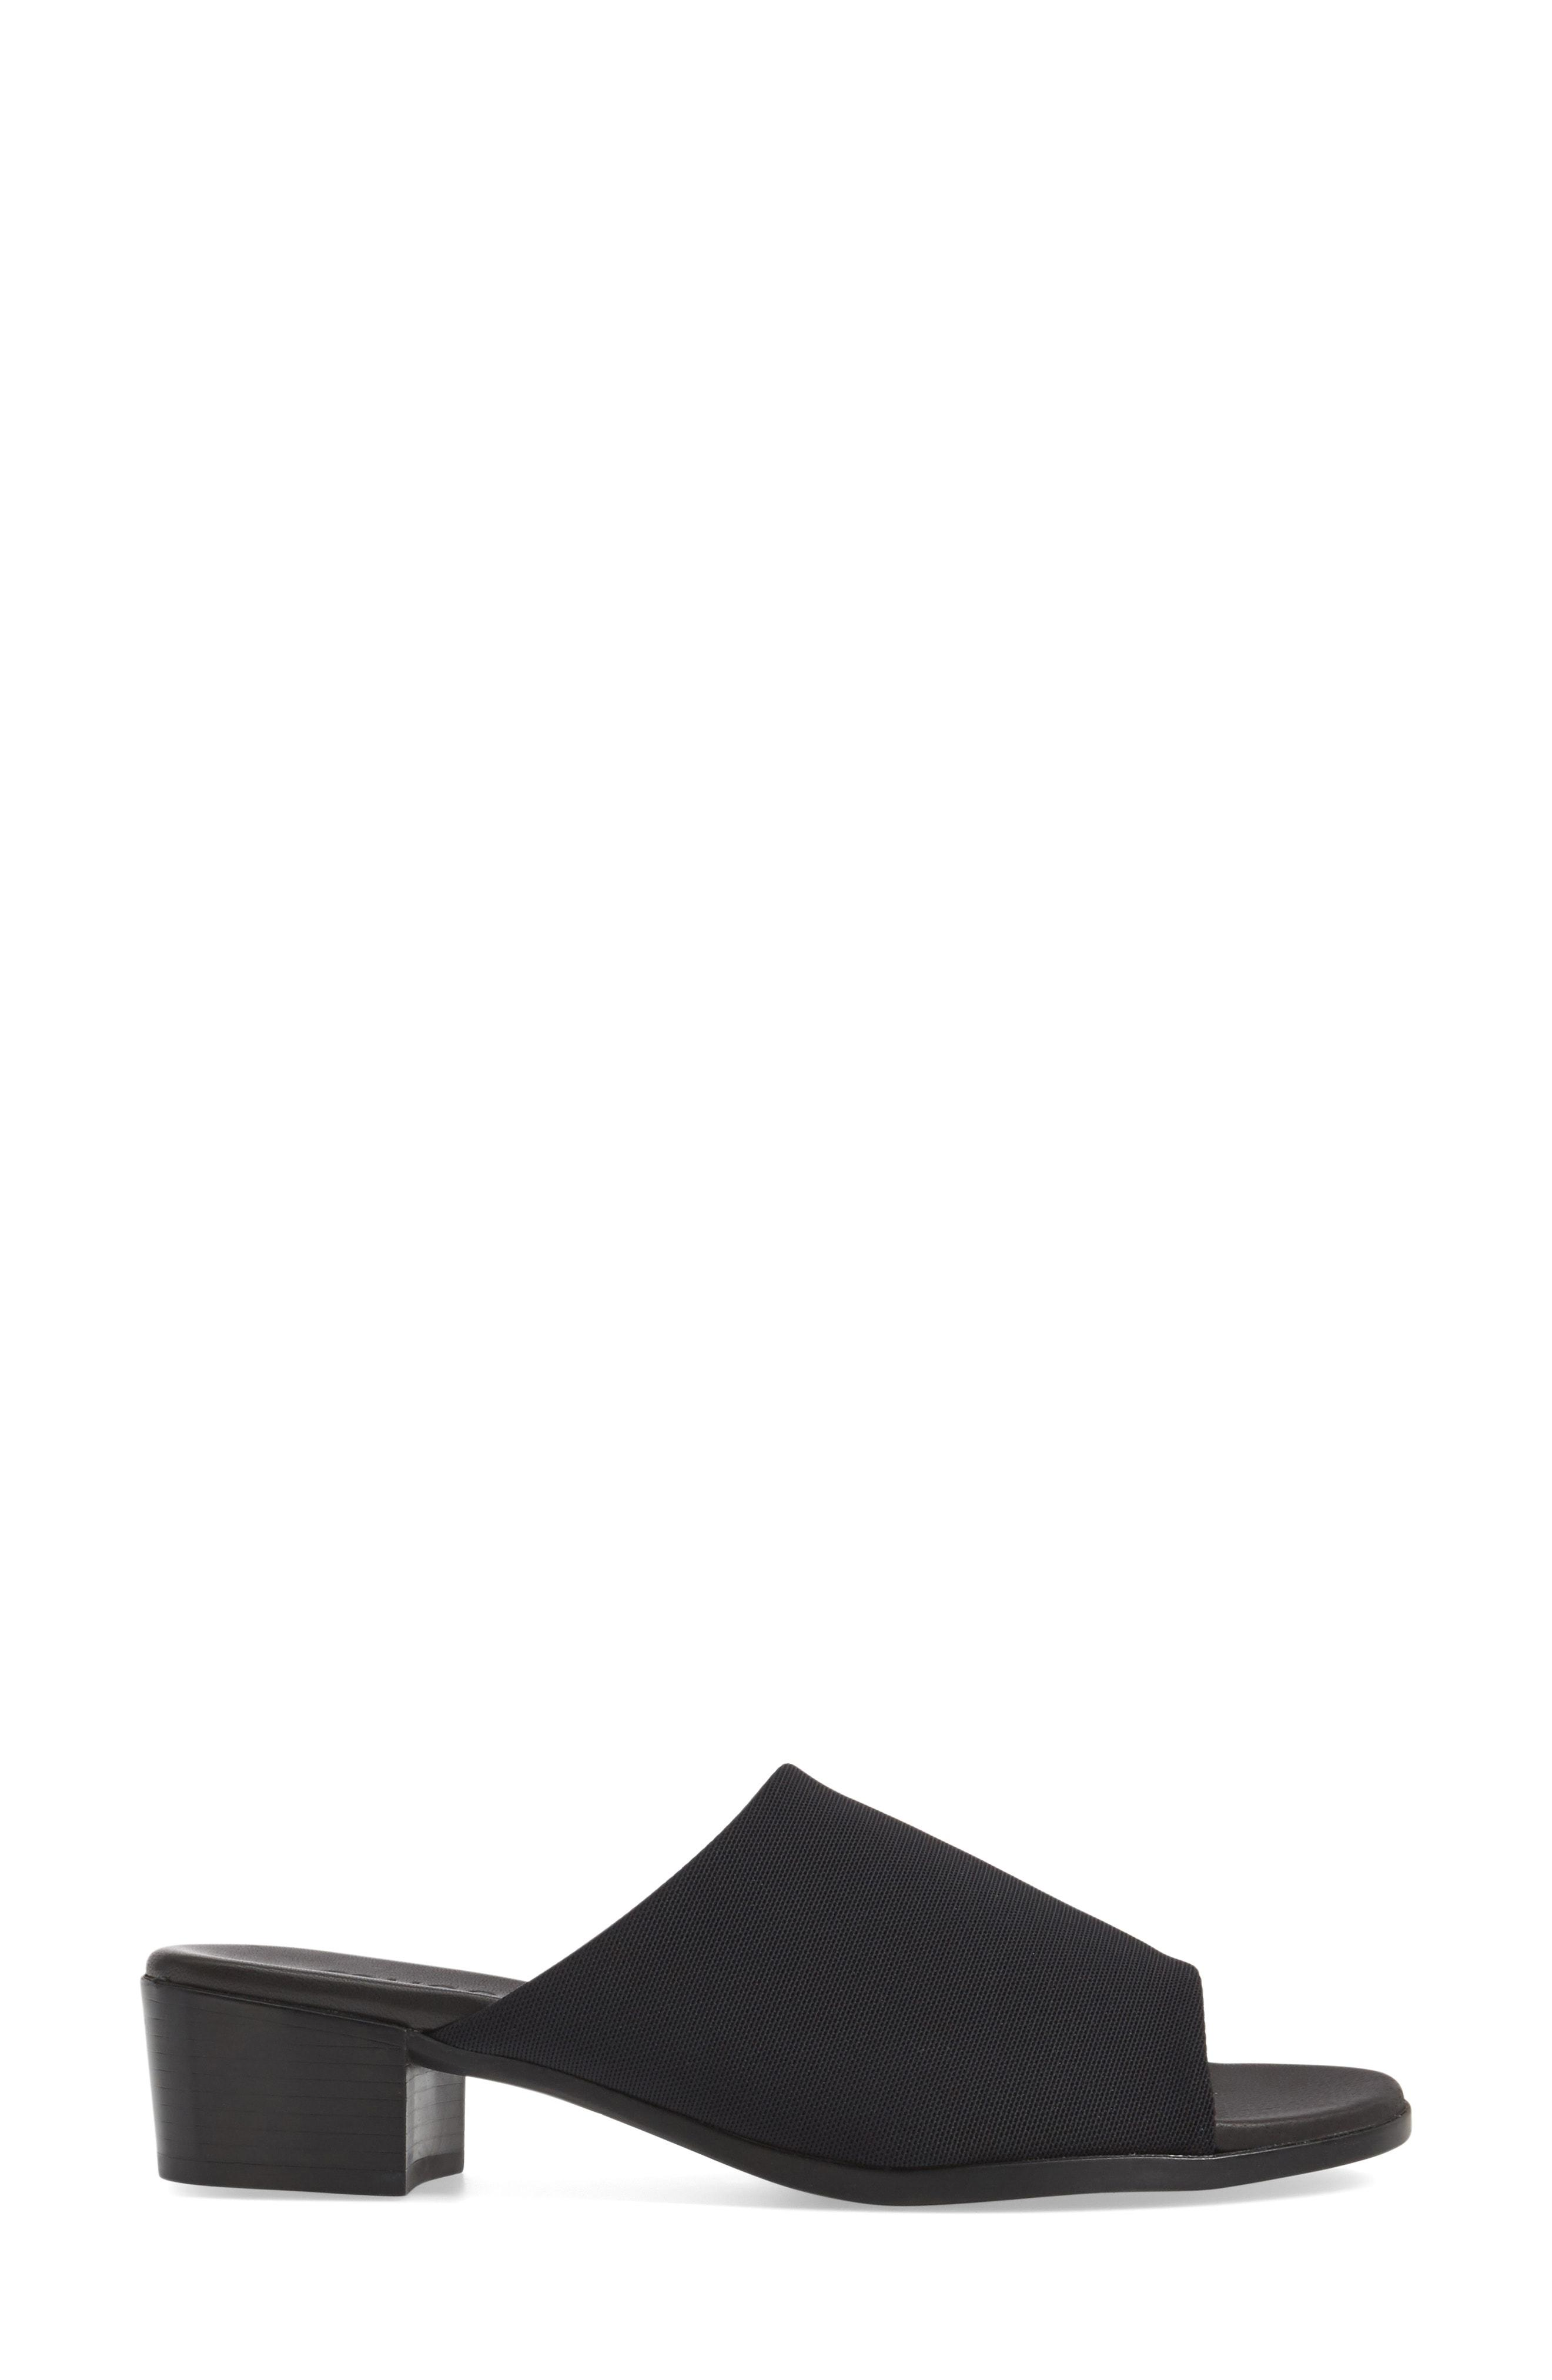 a3685961c24b Munro Beth Slide Sandal In Black Fabric